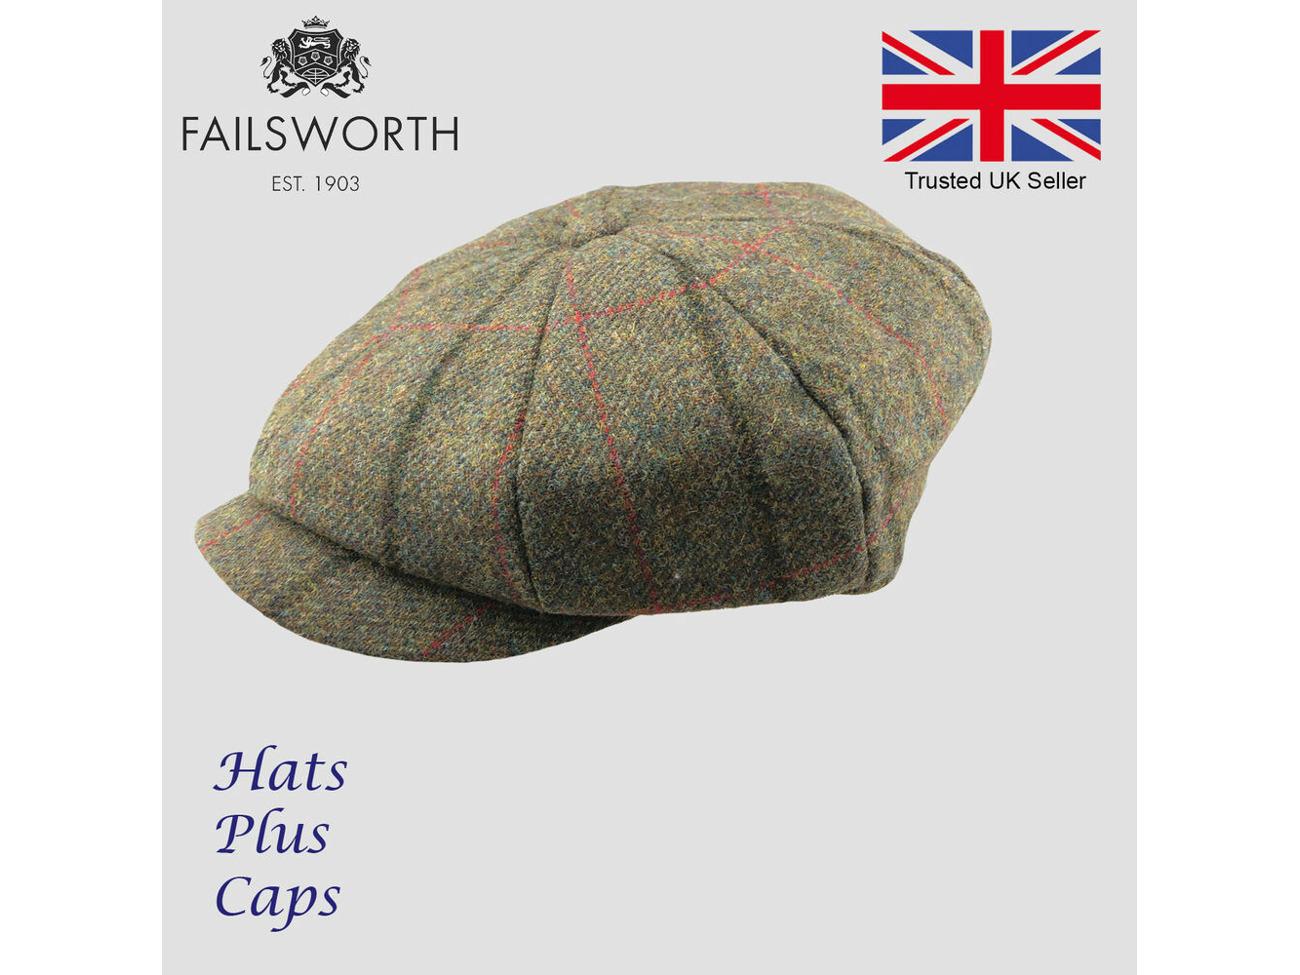 071e4785 Buy Failsworth Alfie Peaky Blinders Newsboy Cap English Tweed 100% Wool  Country Hat | Fat Llama